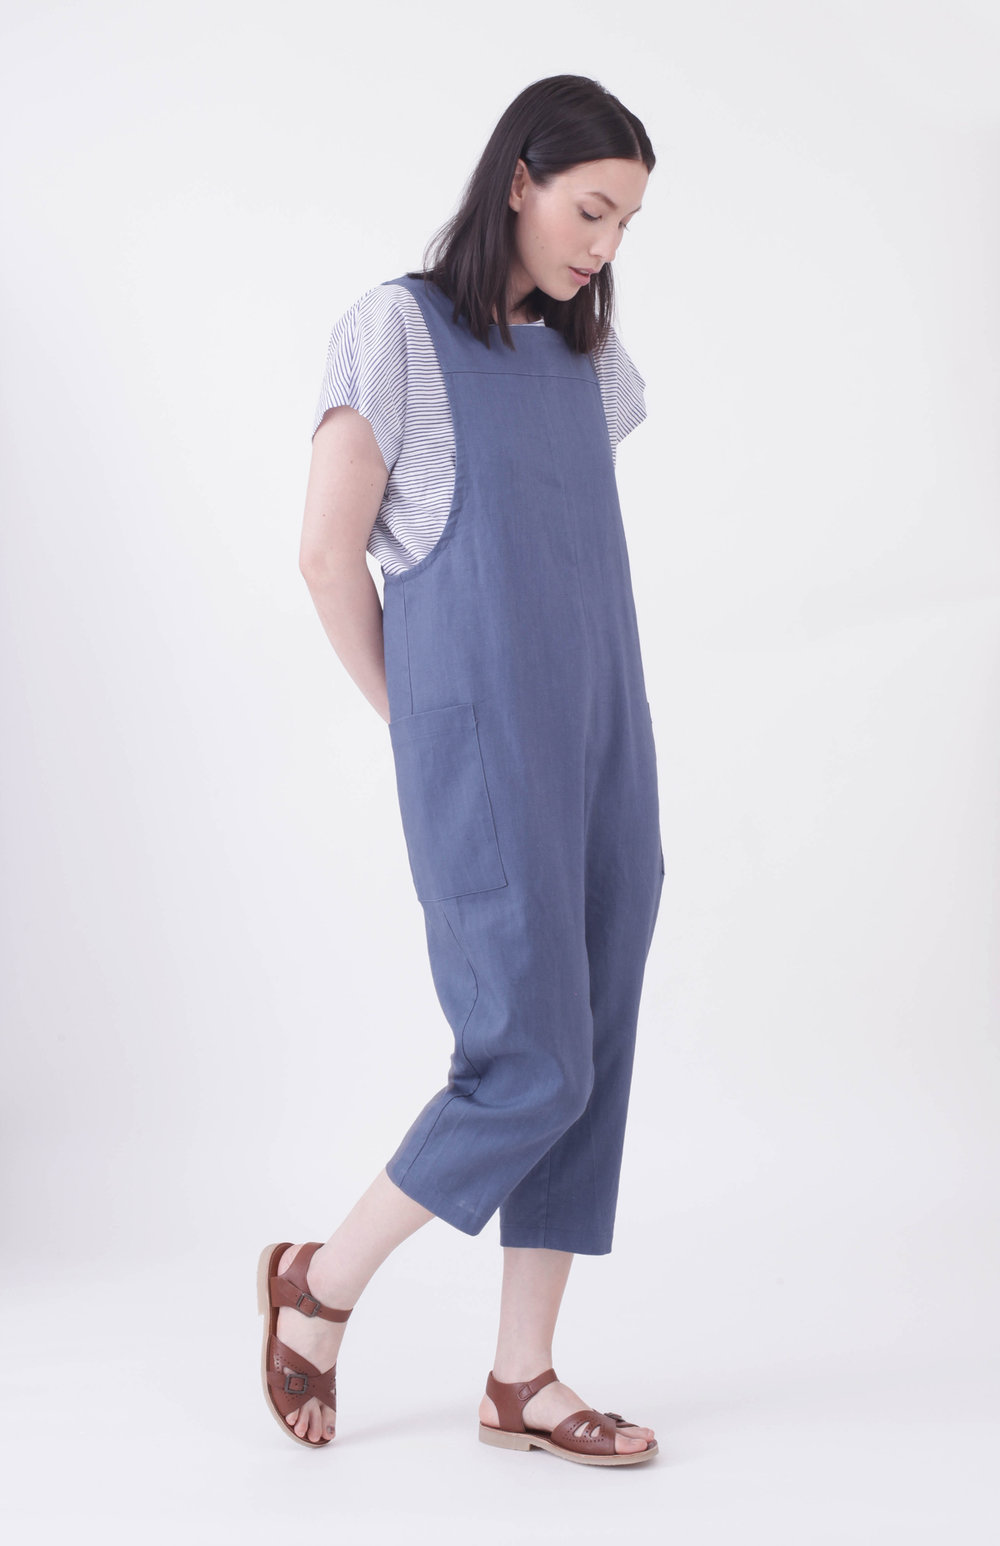 Cross back Overalls - Indigo 100% Linen